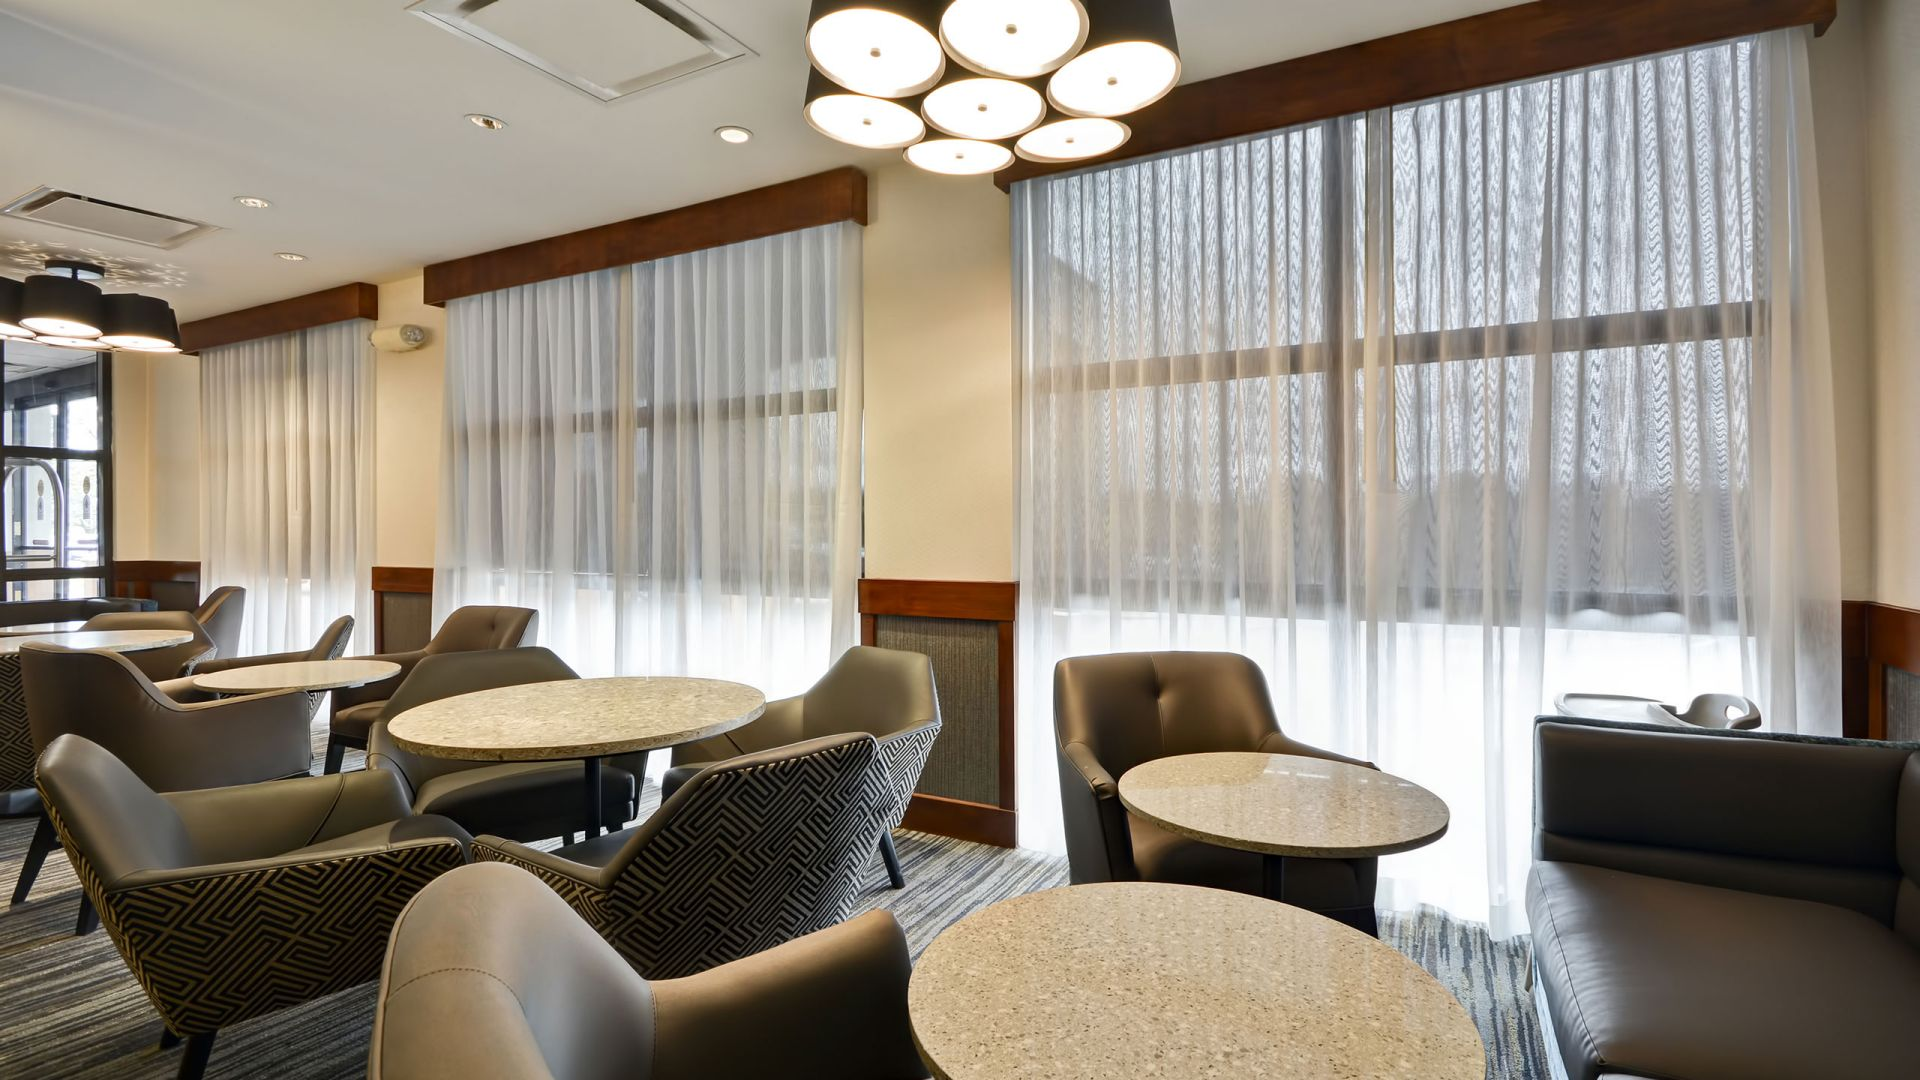 Hyatt Place Kansas City / Overland Park / Metcalf Hotel Lobby Window Seats